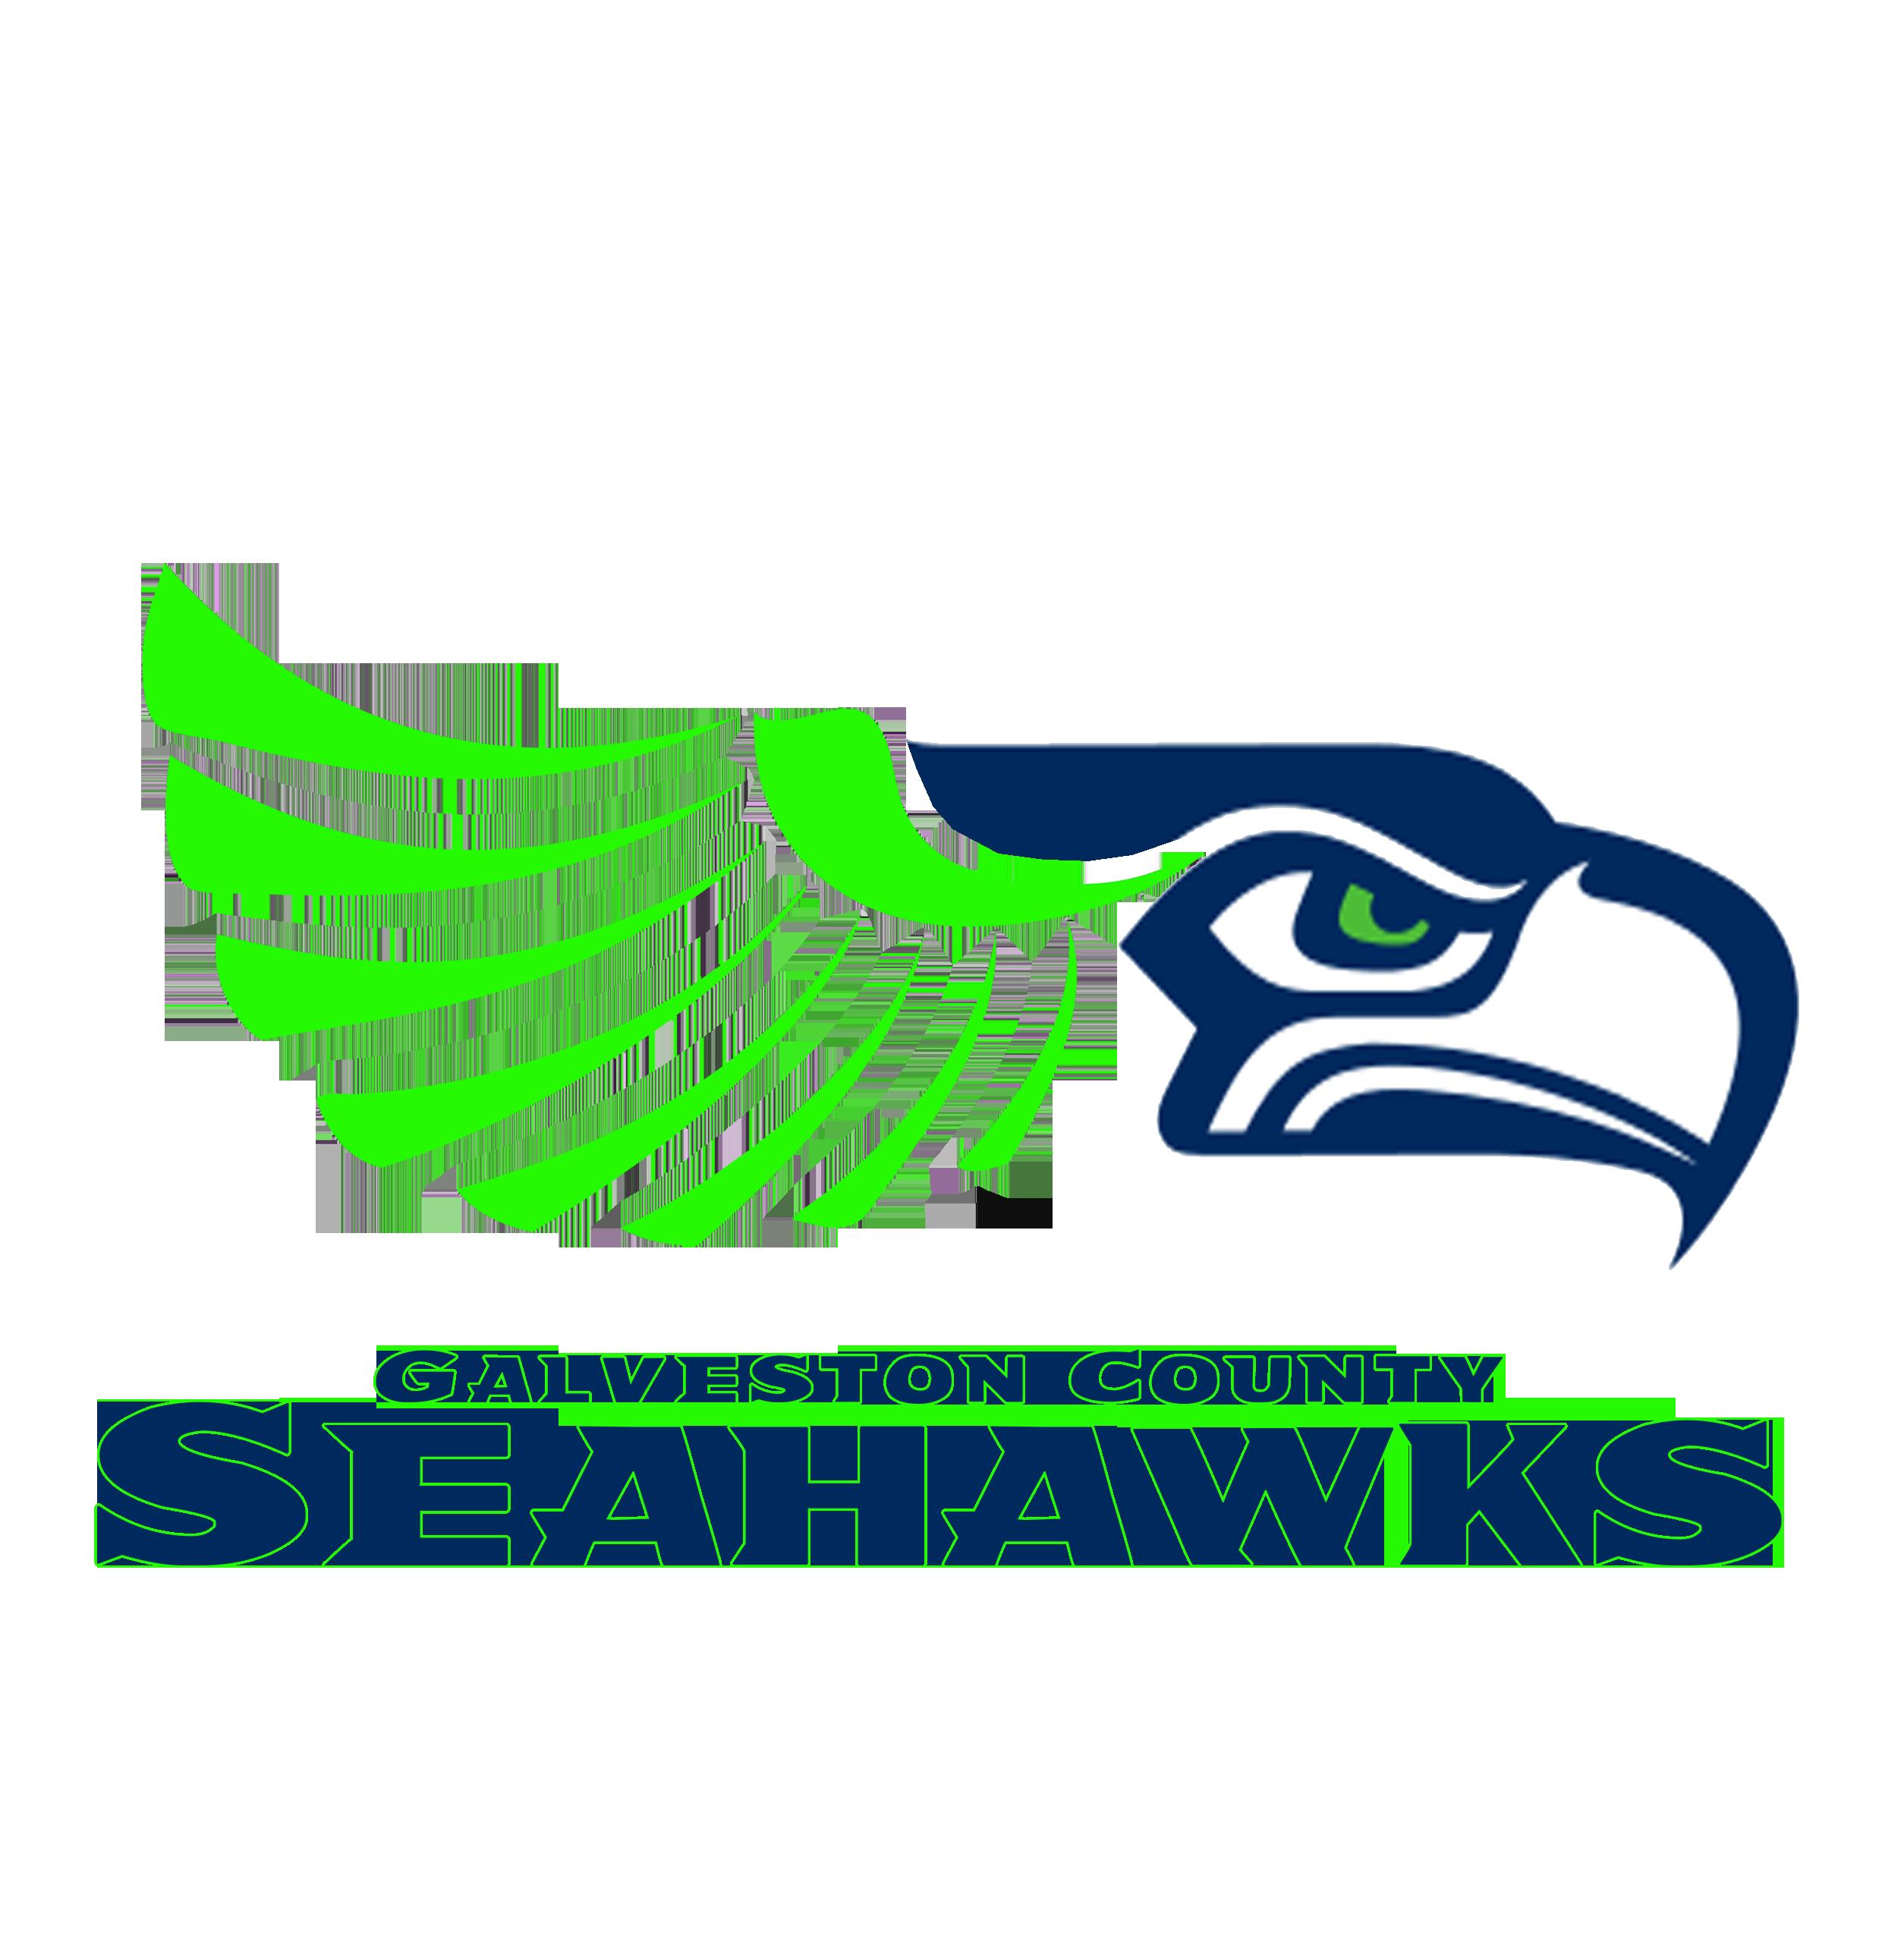 Galveston County Seahawks - Galveston County Seahawks